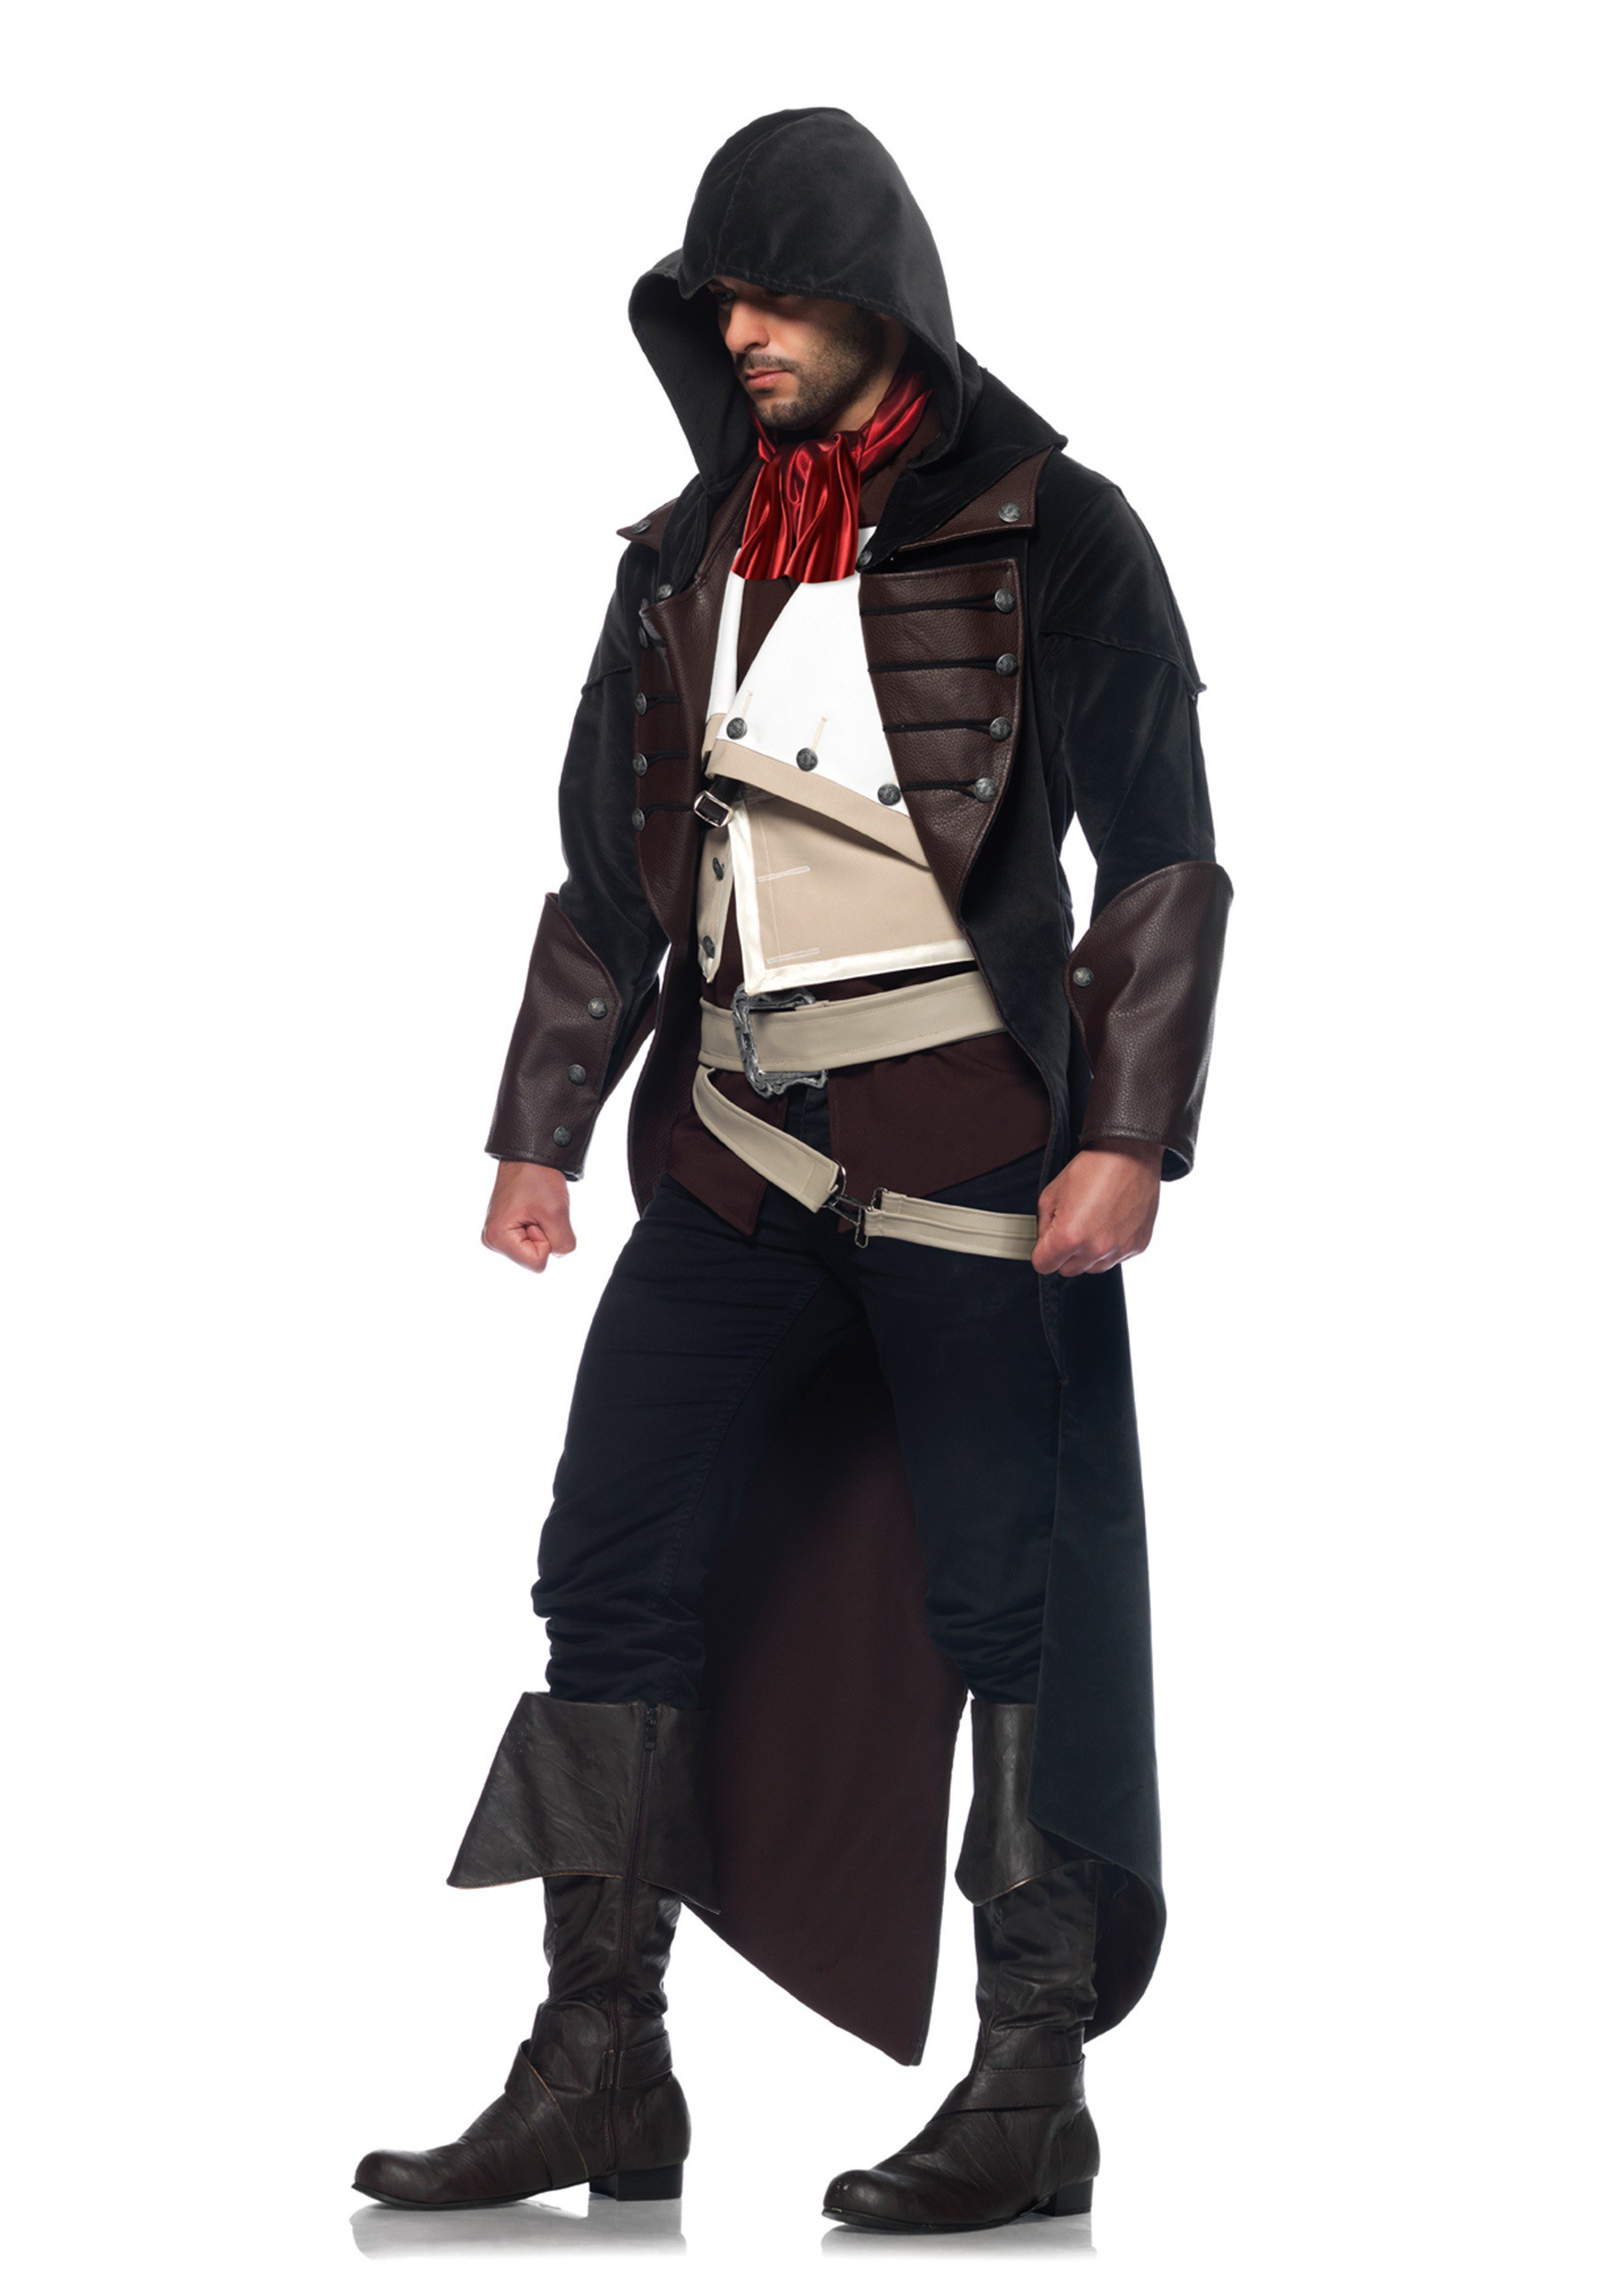 Assassins Creed Arno Dorian Deluxe Costume